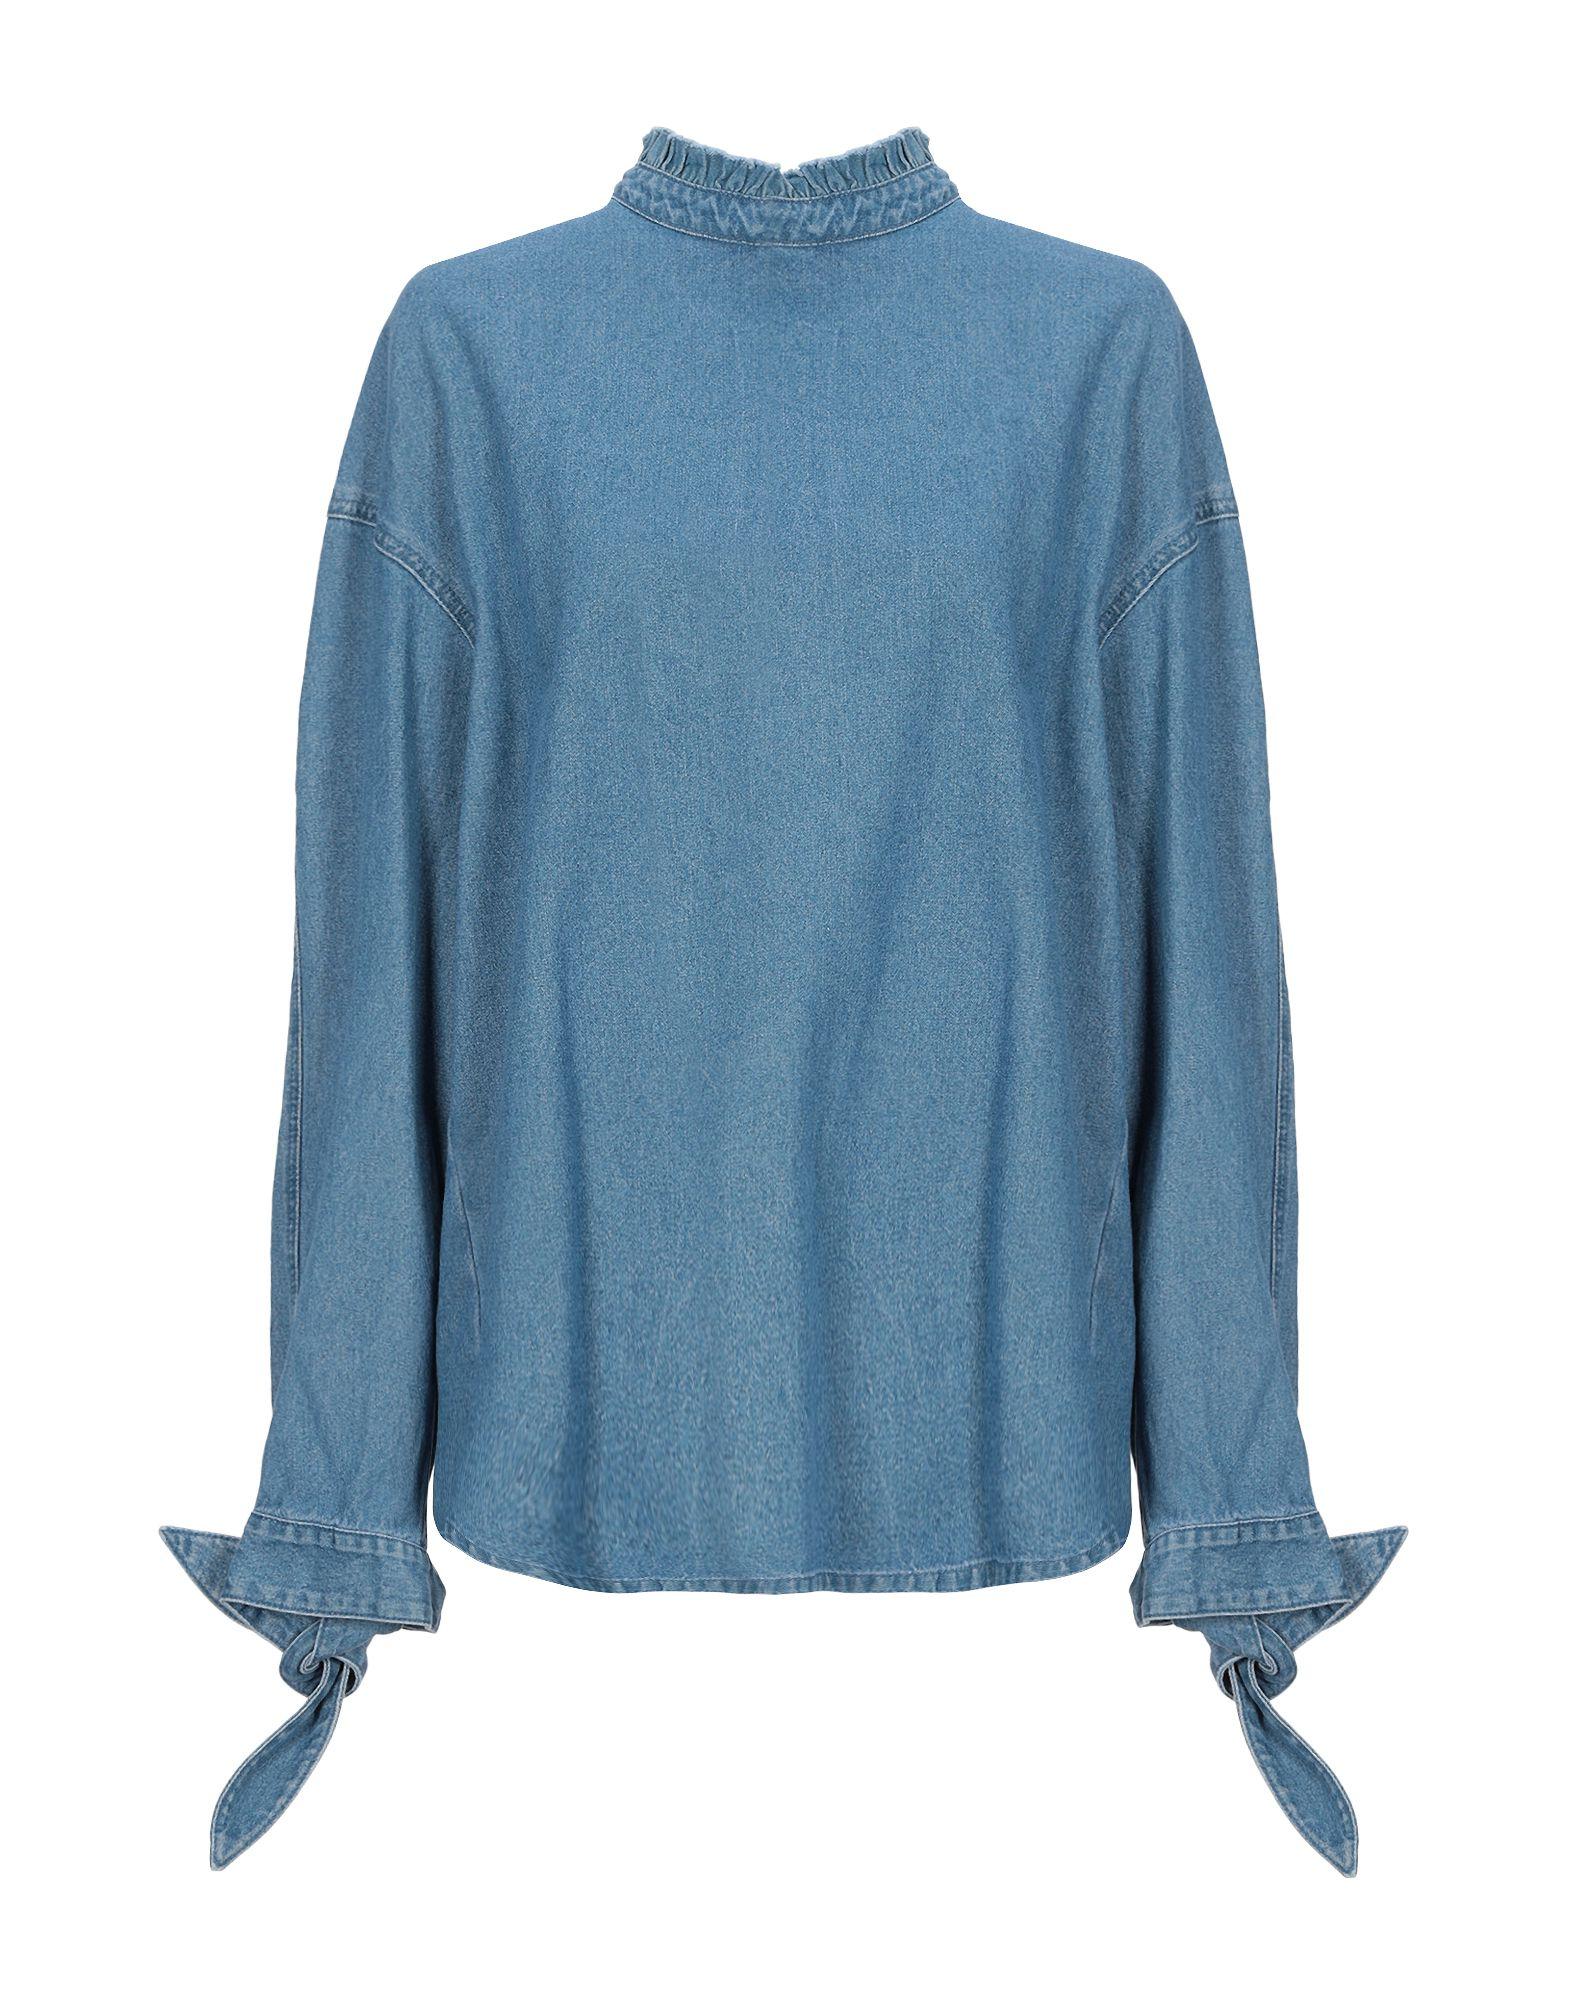 клубная рубашка мужская